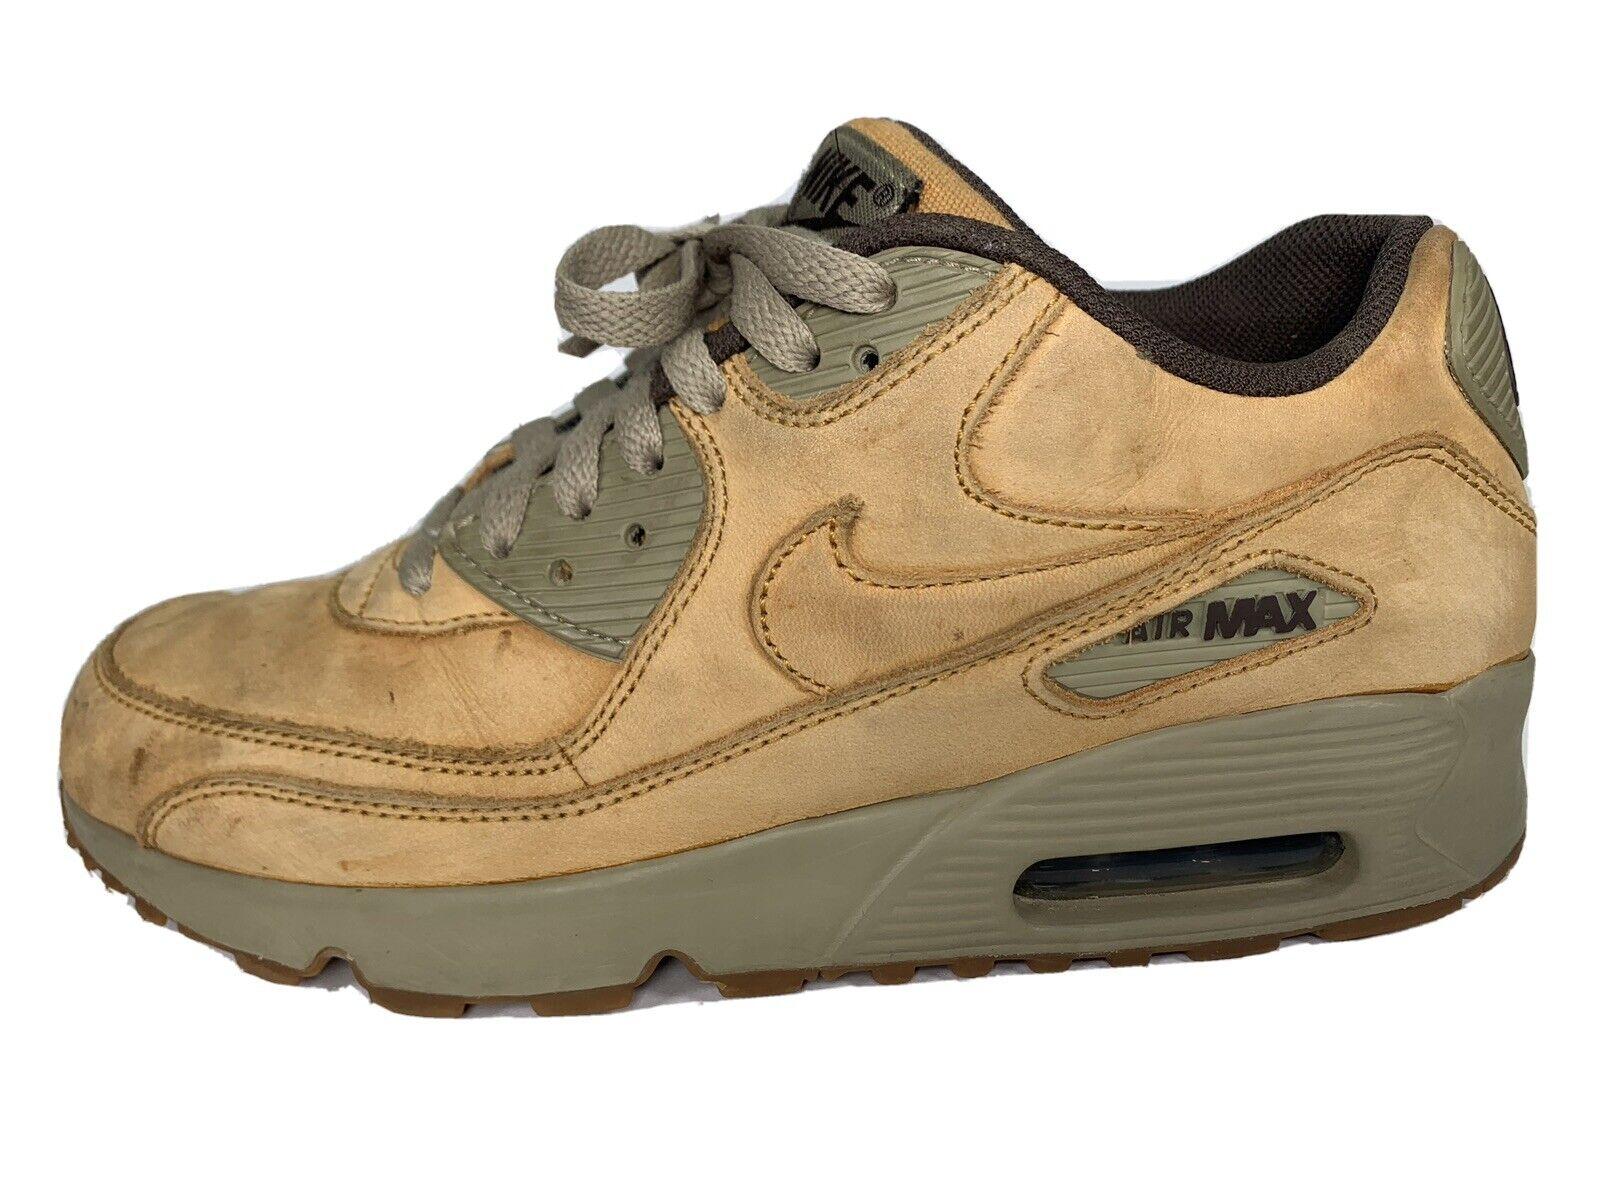 Nike Air Max 90 Winter PRM Flax Wheat GS Size 6y Wheat 943747-700 ...